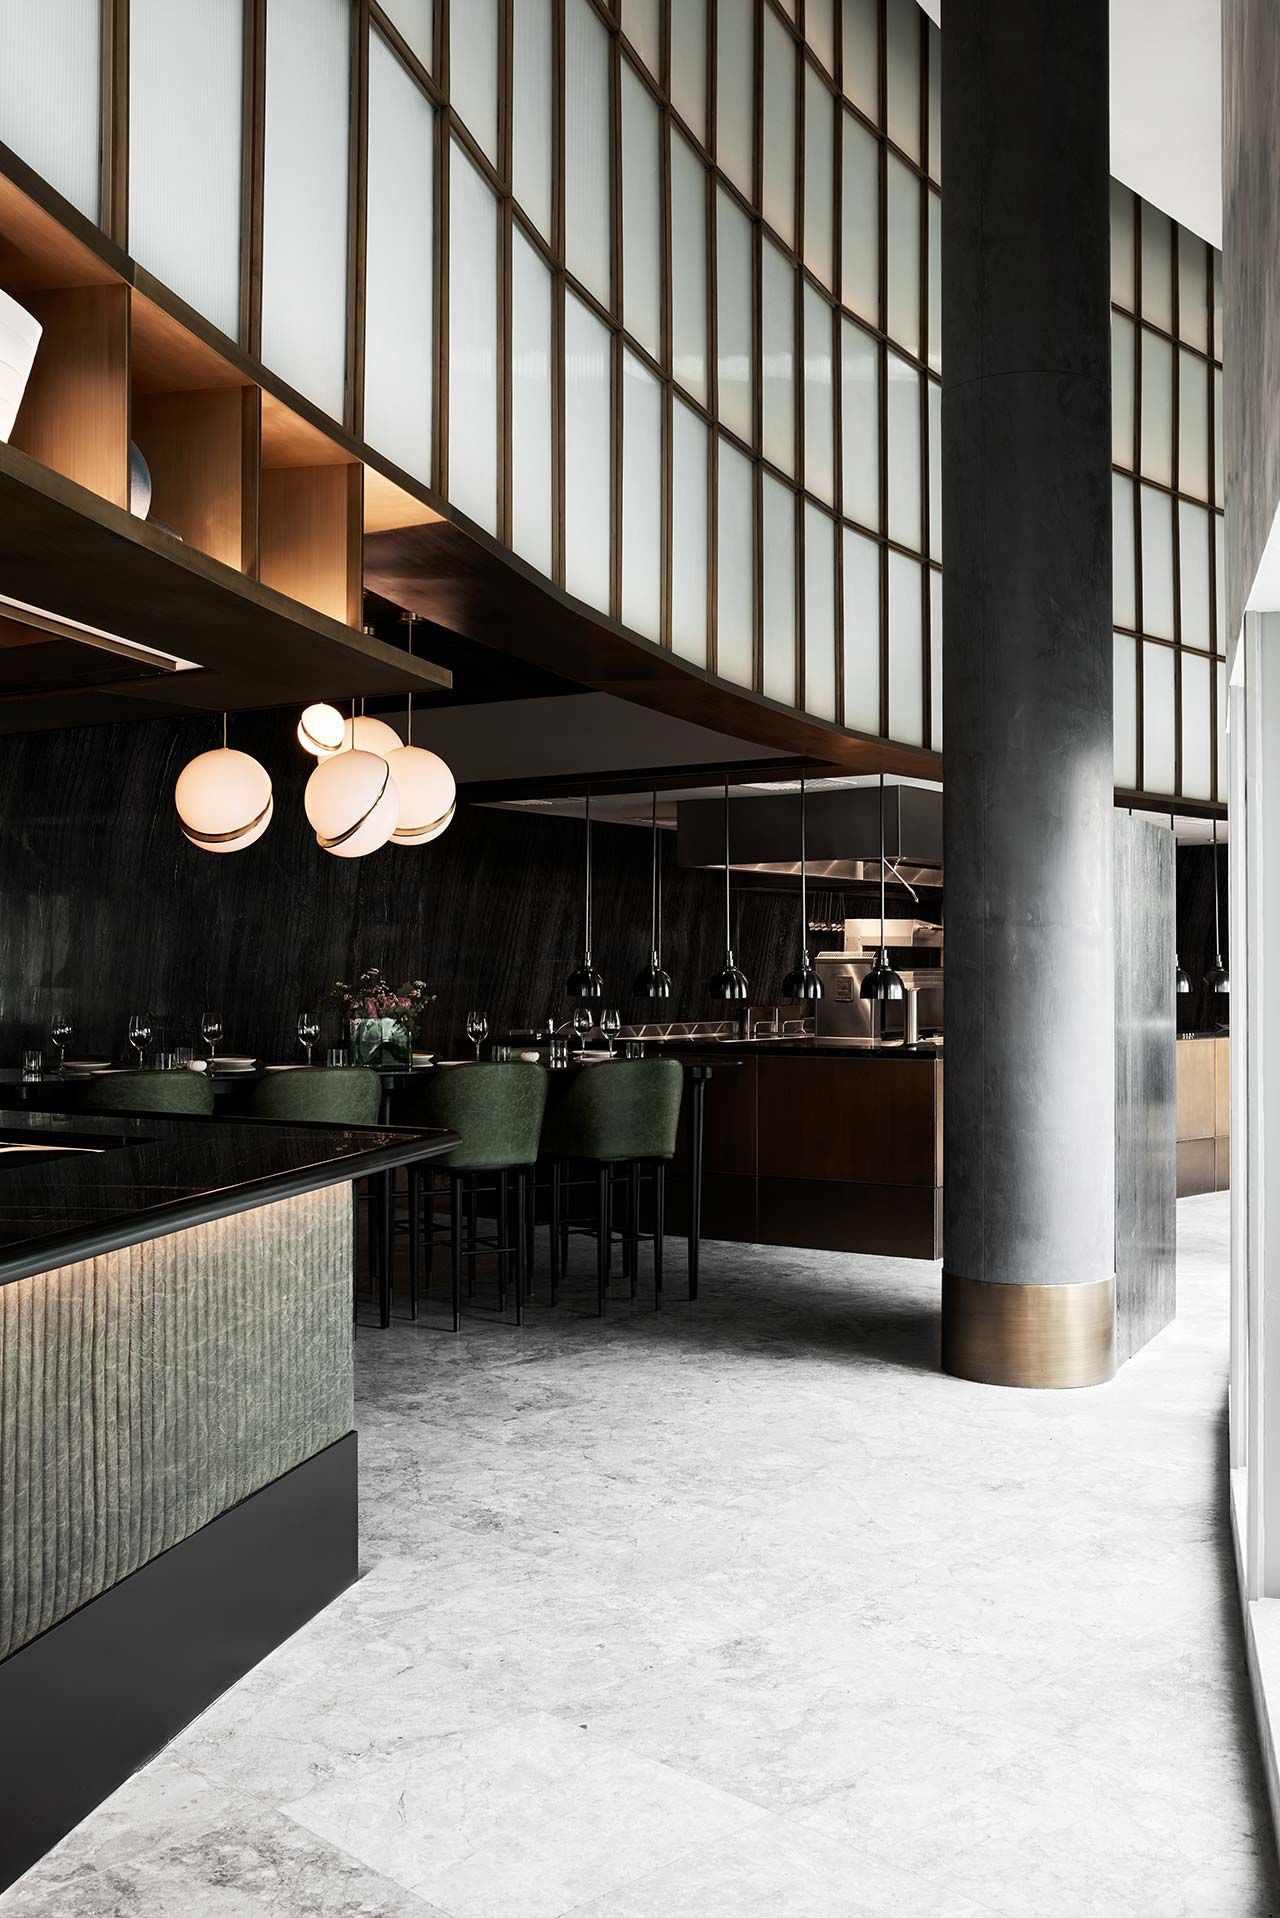 Sean Connolly at Dubai Opera | Opera, Restaurants and Interiors